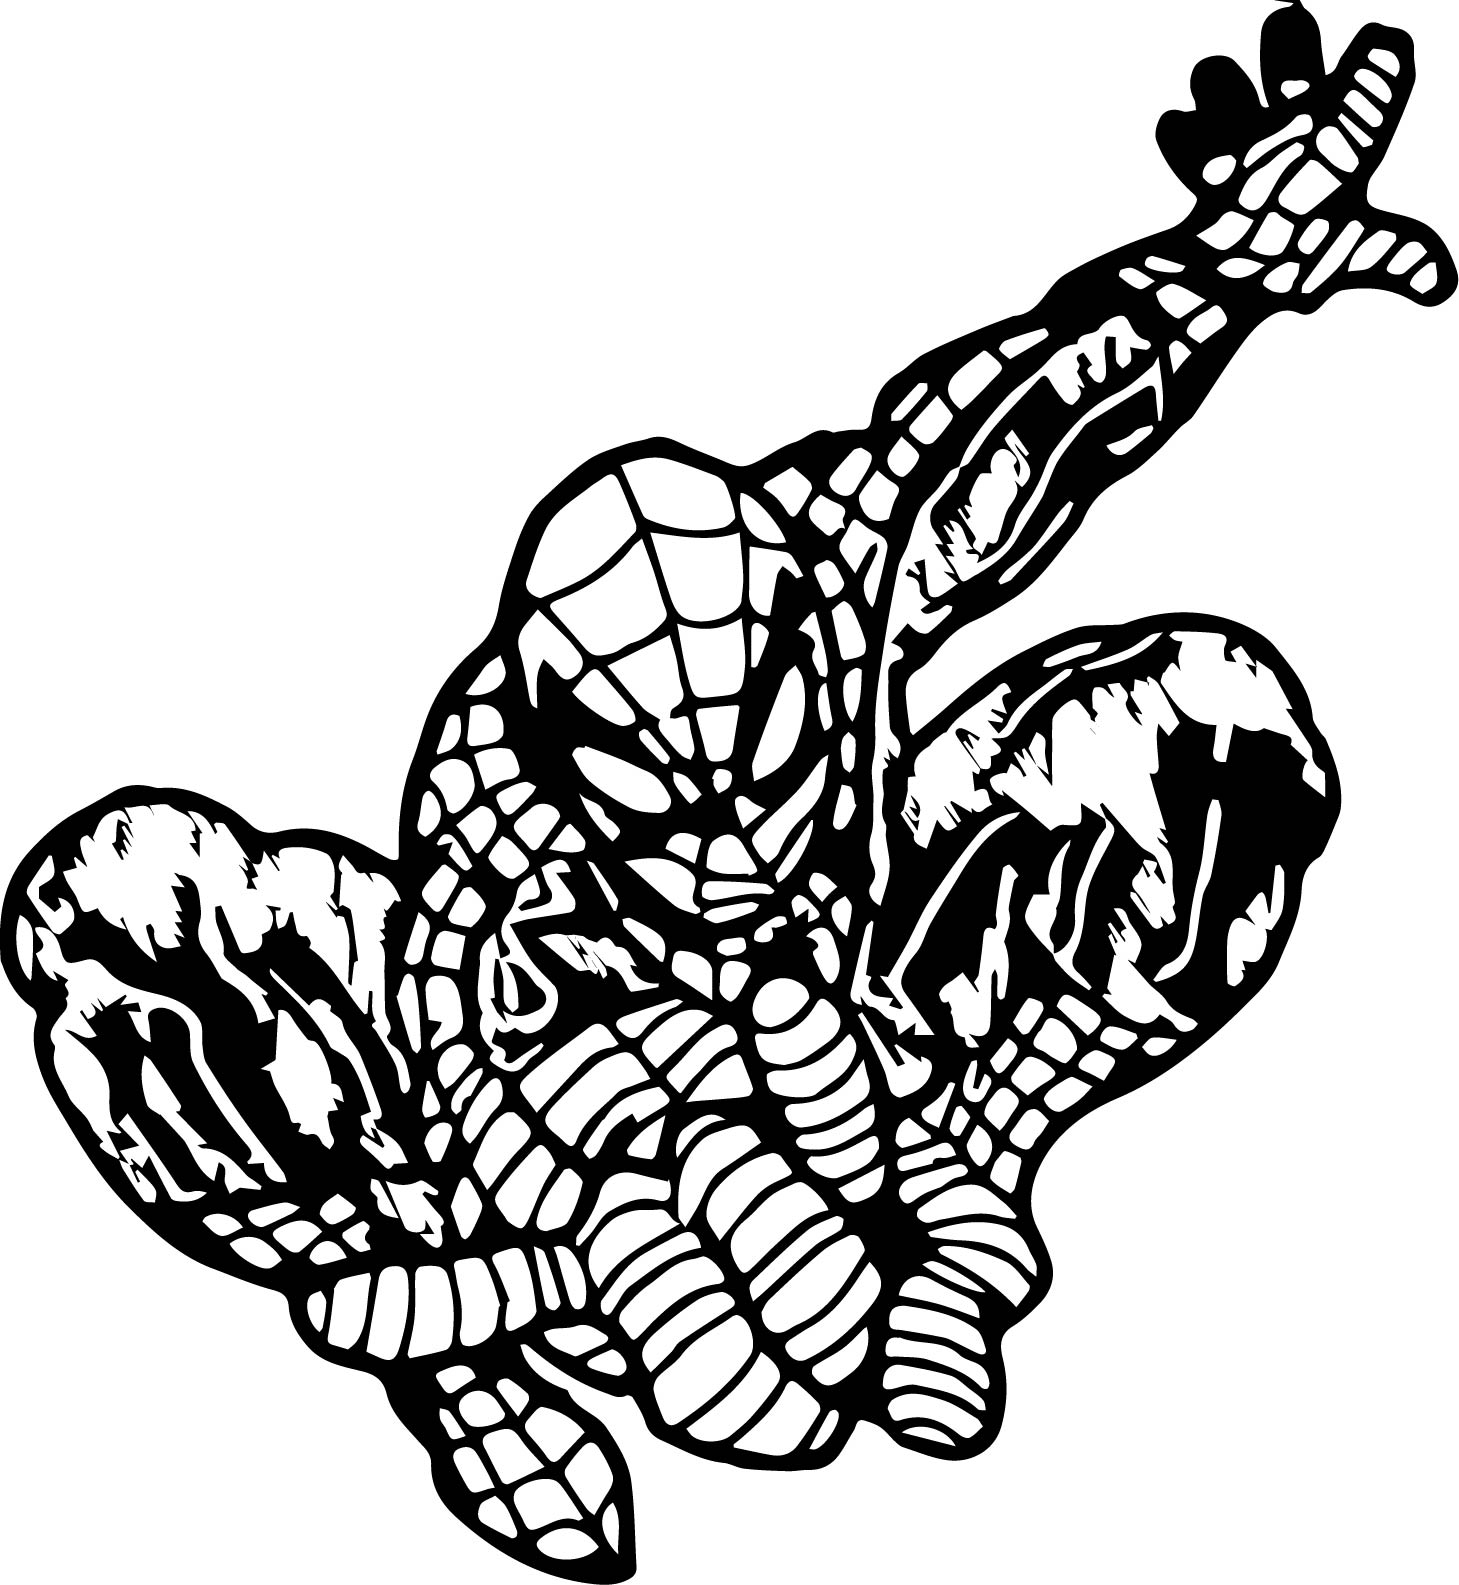 Spiderman Kleur Spider Man Coloring Page